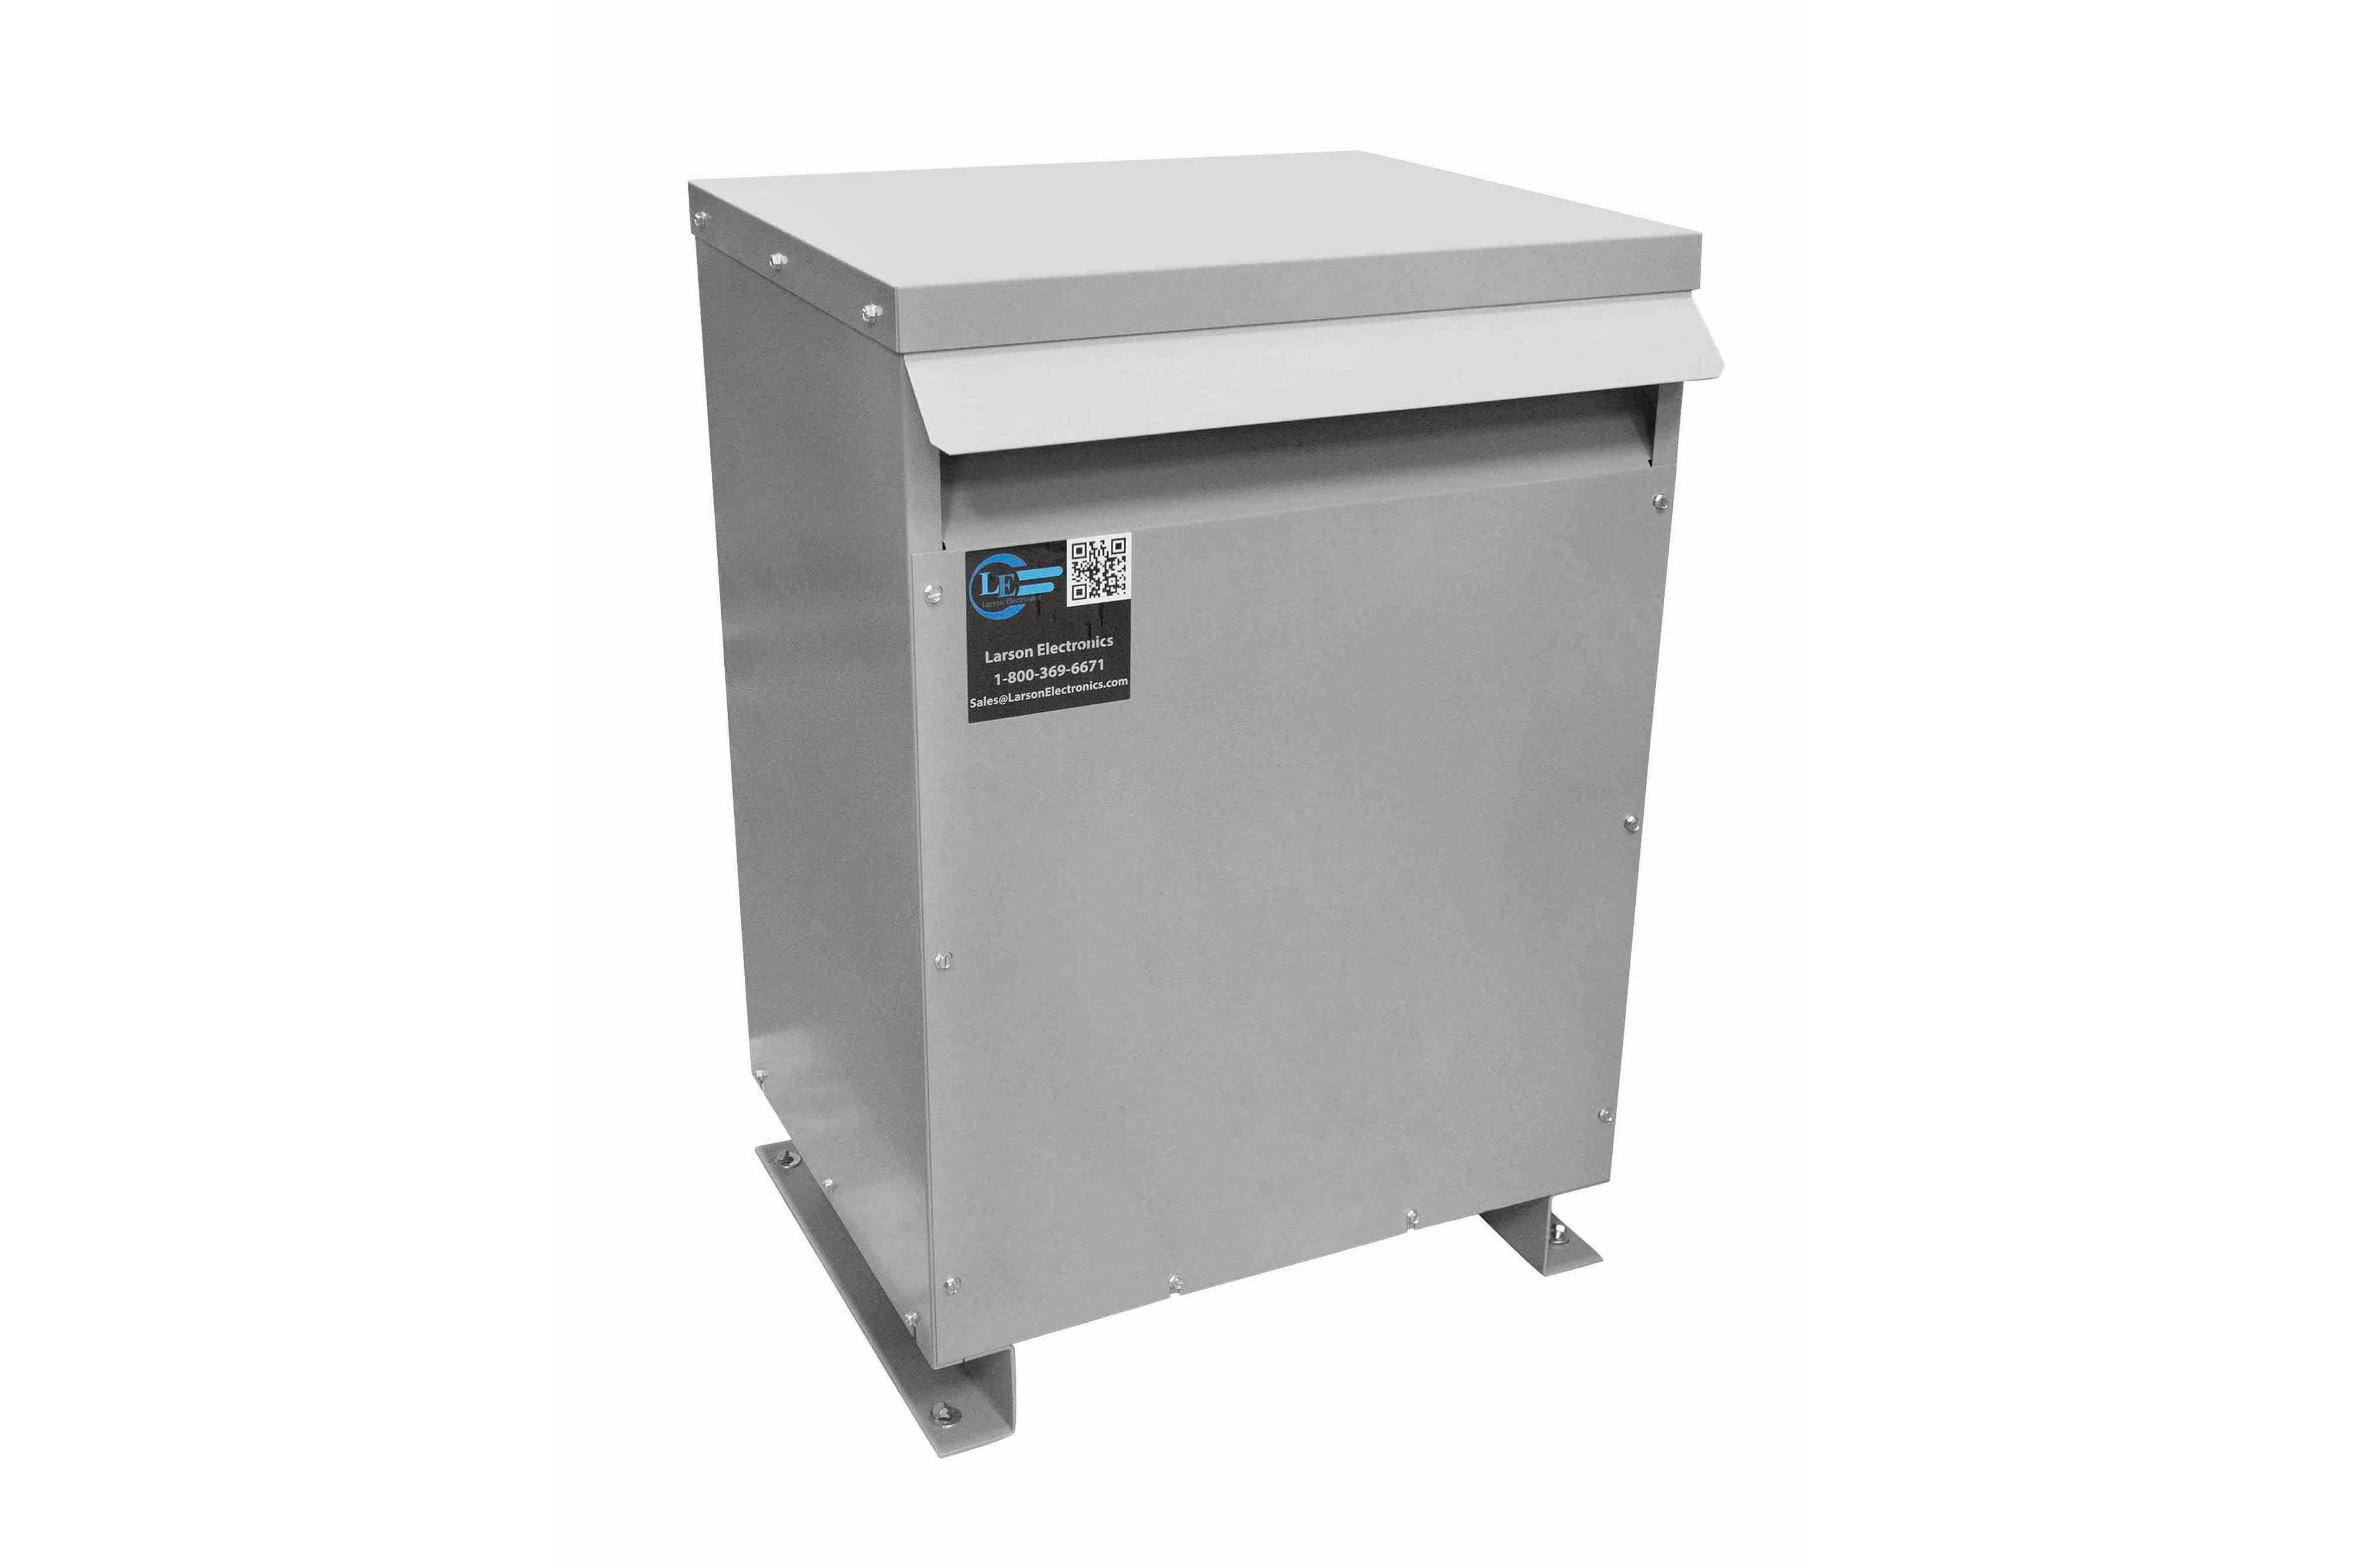 12 kVA 3PH Isolation Transformer, 600V Wye Primary, 240V Delta Secondary, N3R, Ventilated, 60 Hz